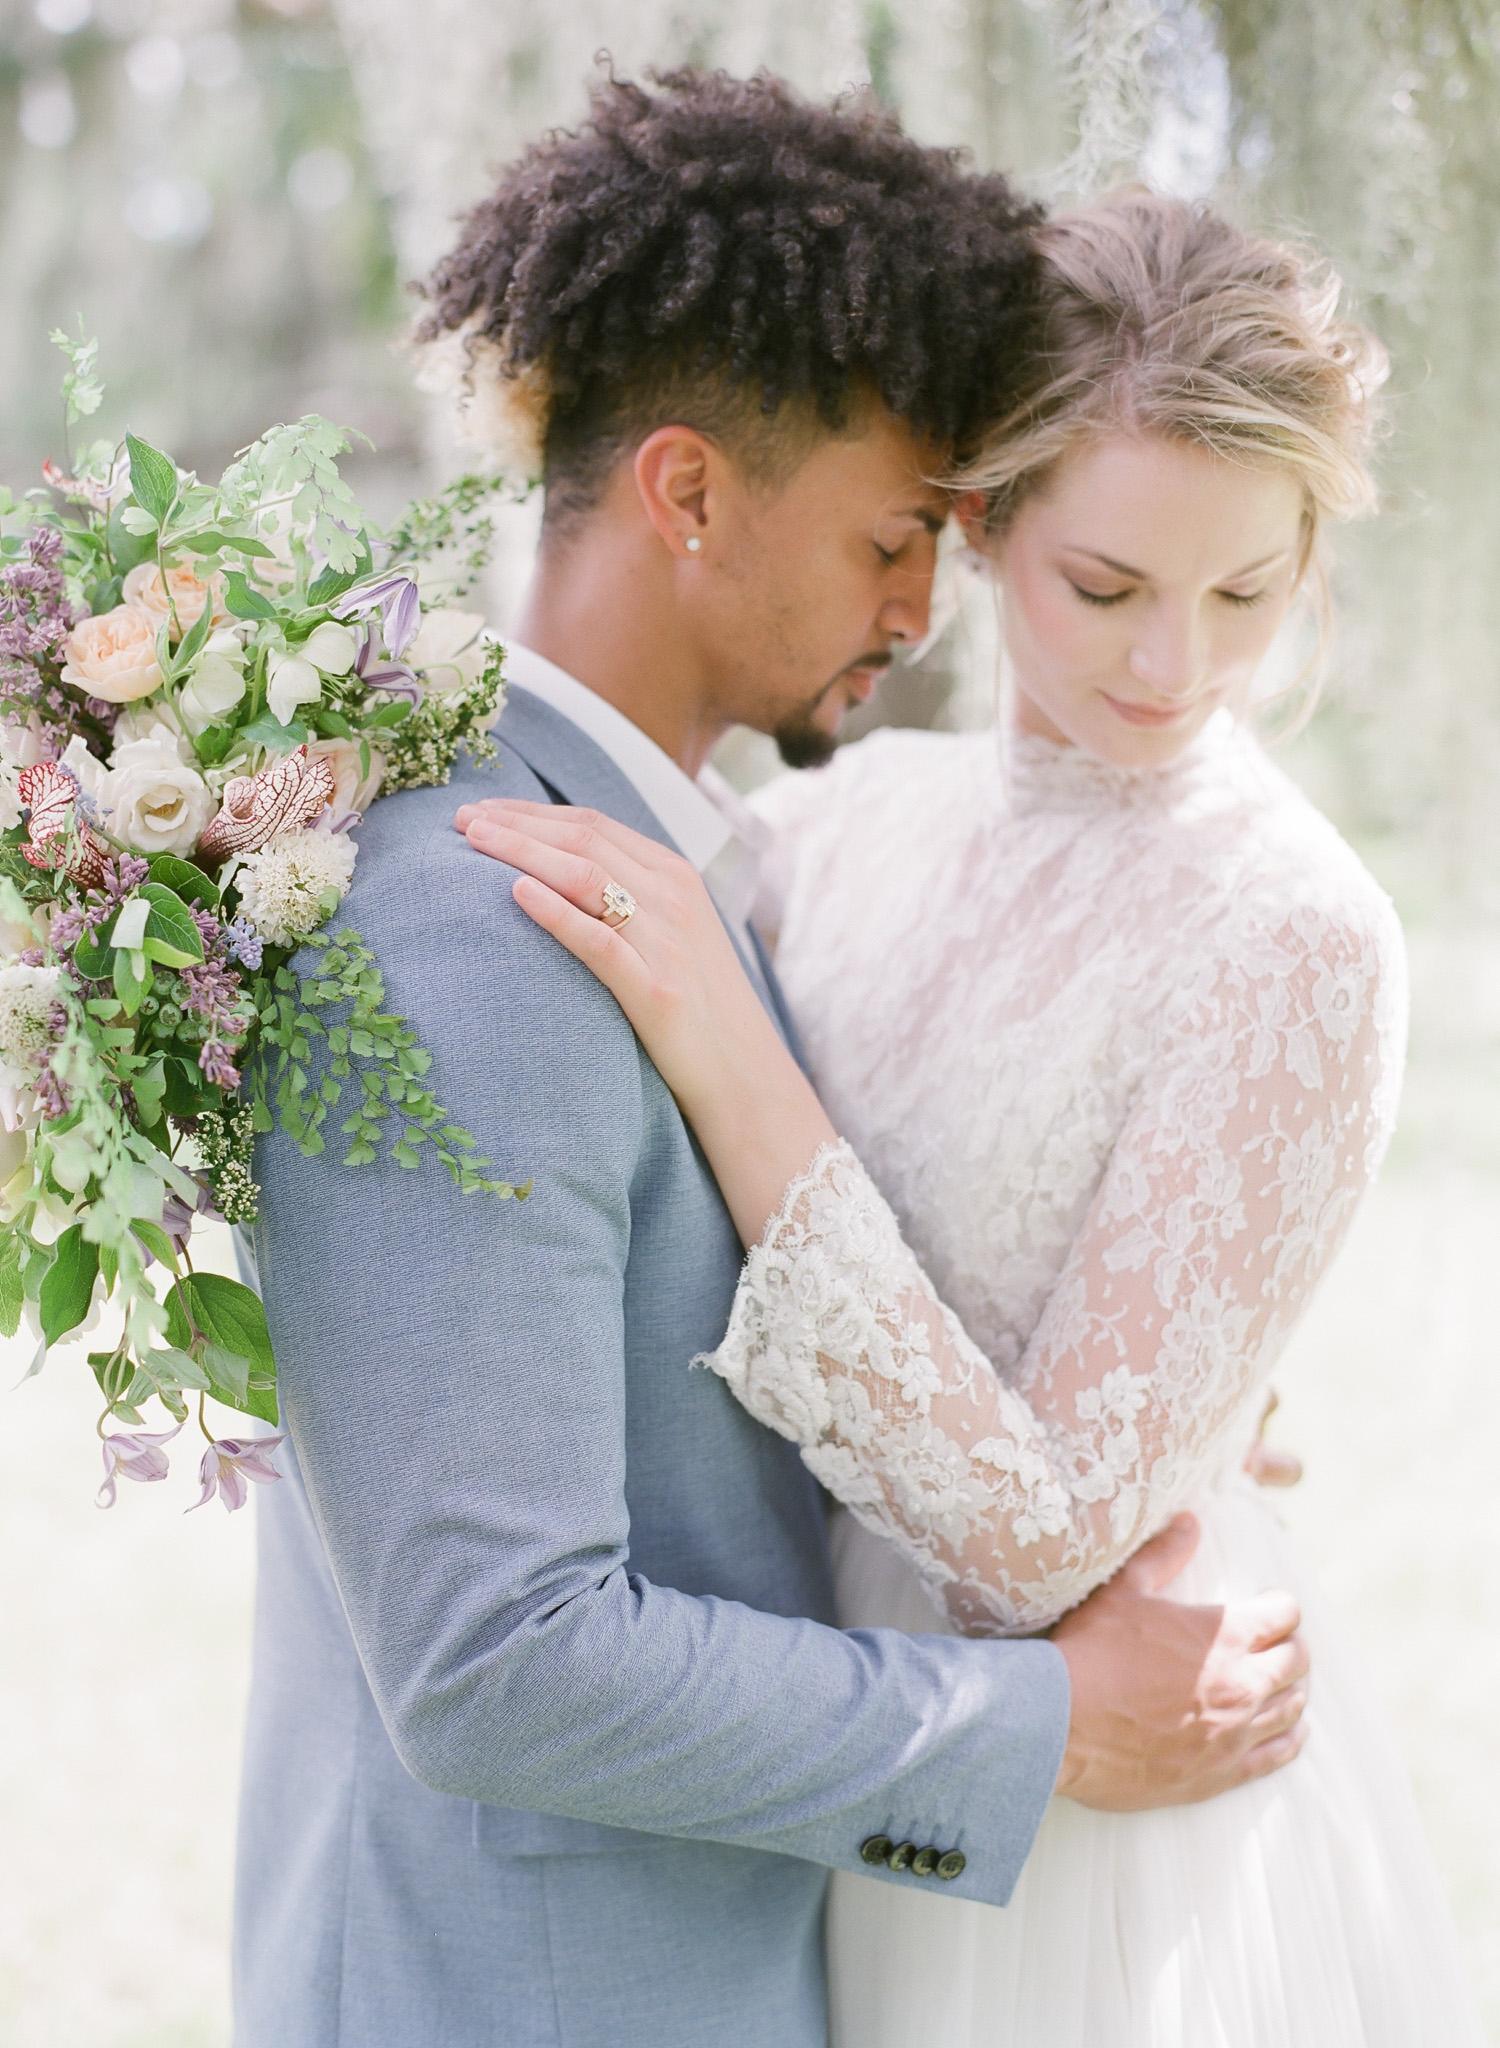 Charleston-Kiawah-River-Weddings-1-2.jpg